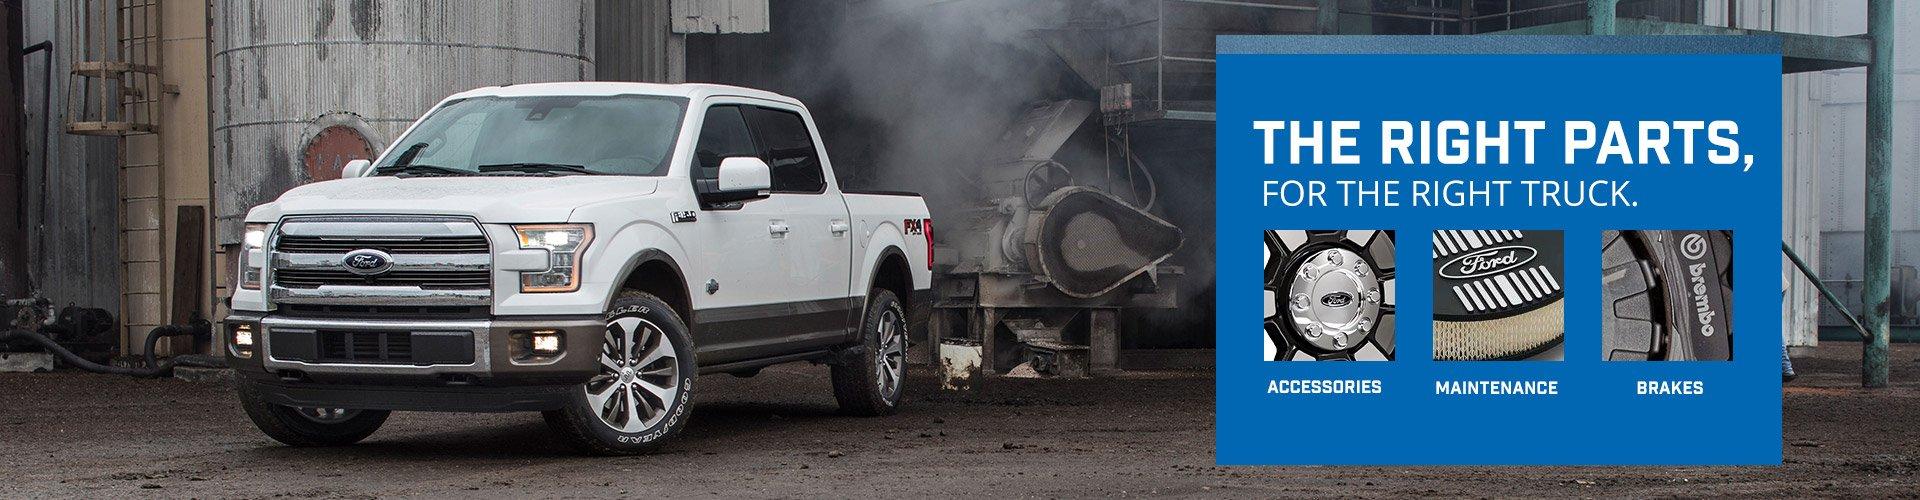 Ford Genuine Truck Parts & Accessories